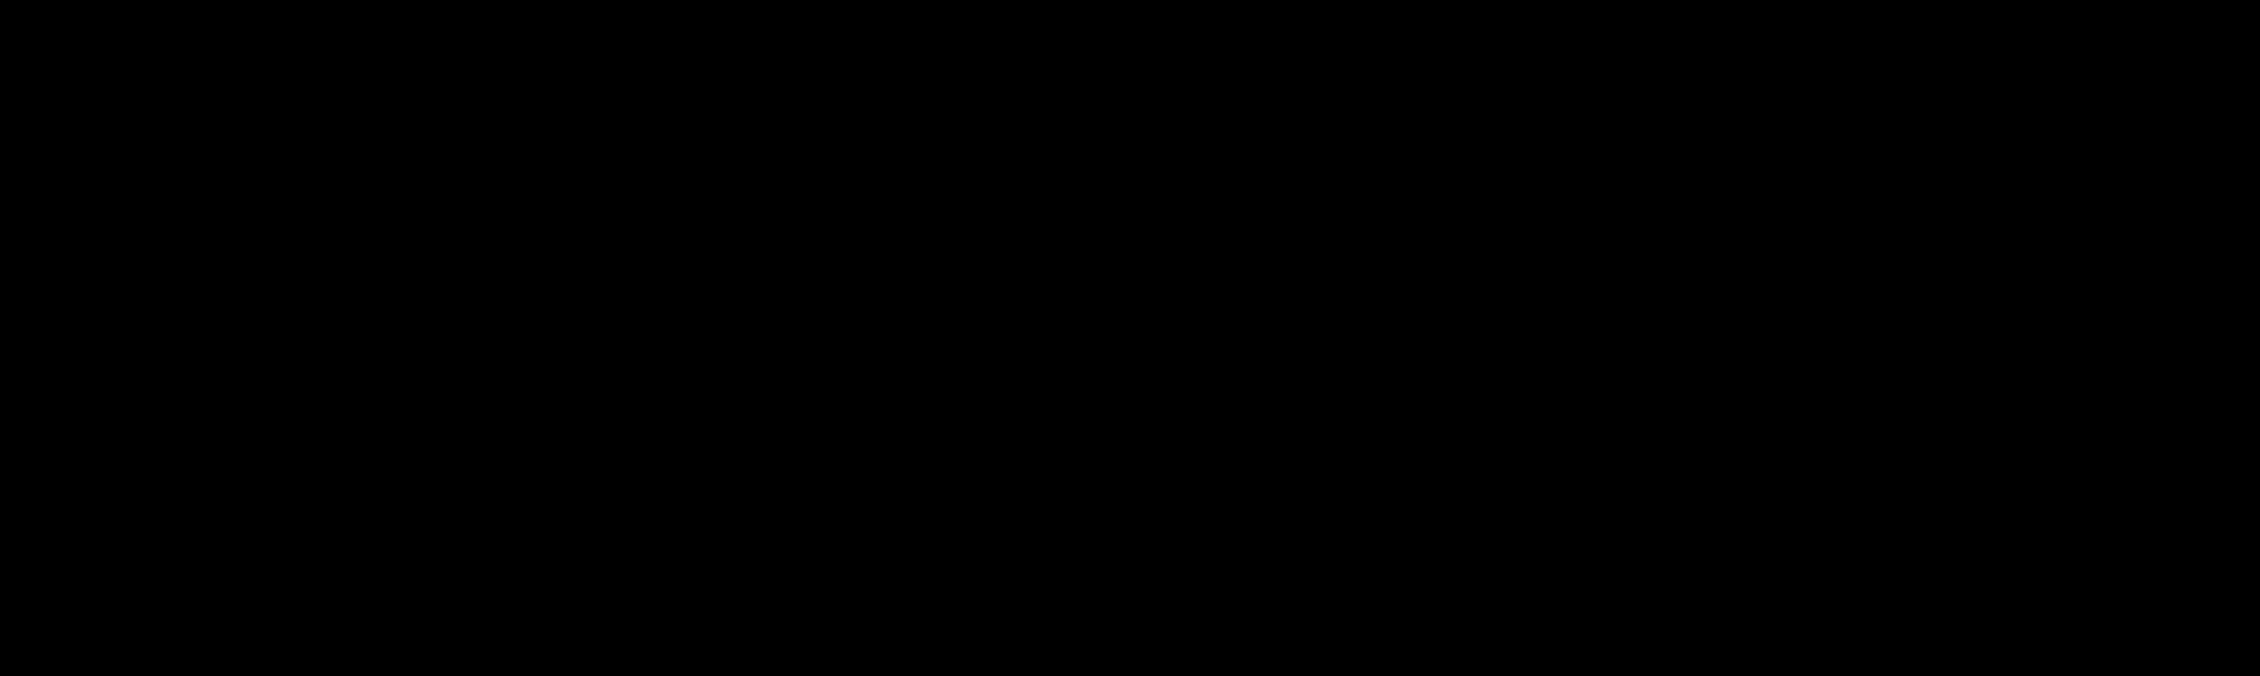 car silhouette clip art at getdrawings com free for personal use rh getdrawings com